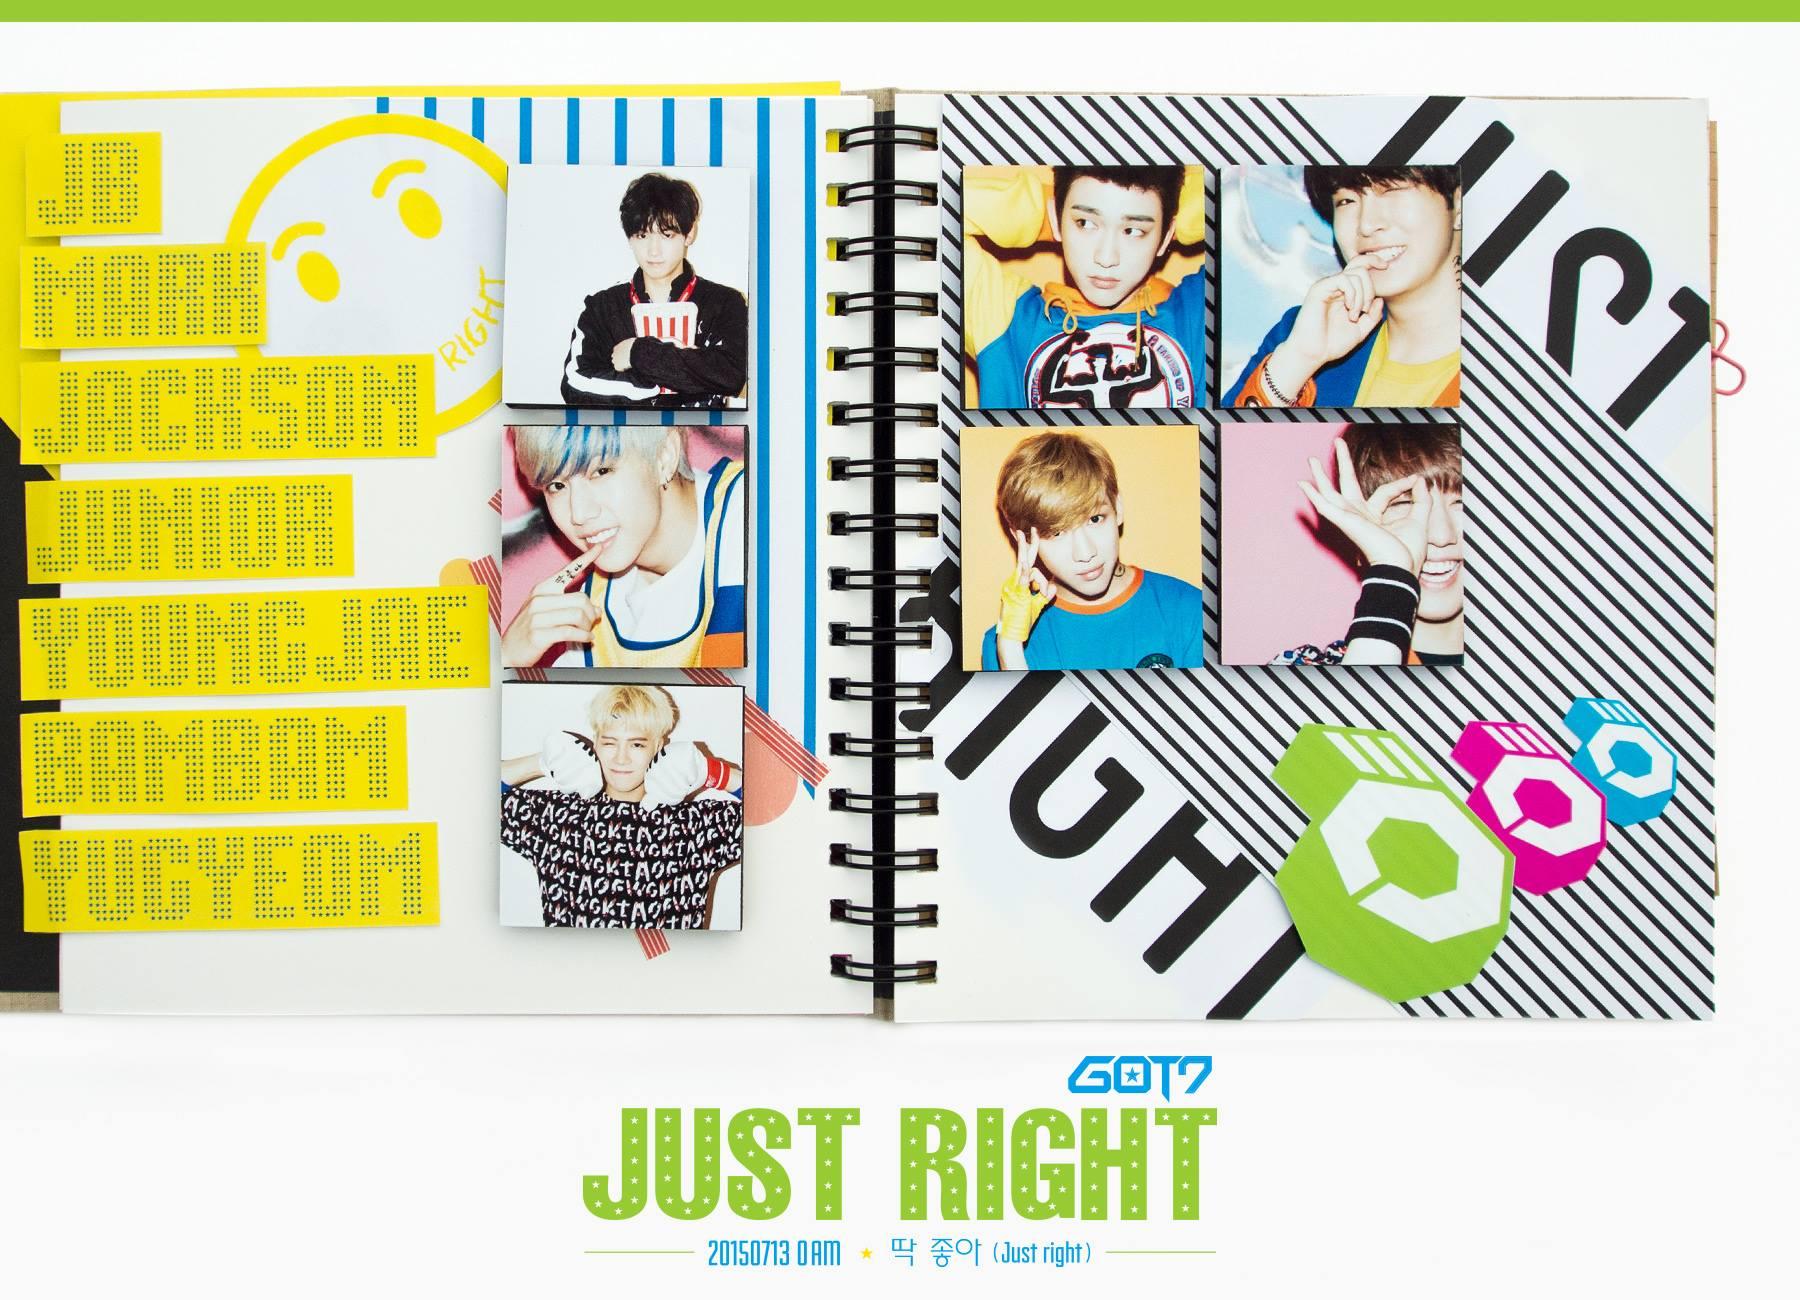 got7 just right teaser 02